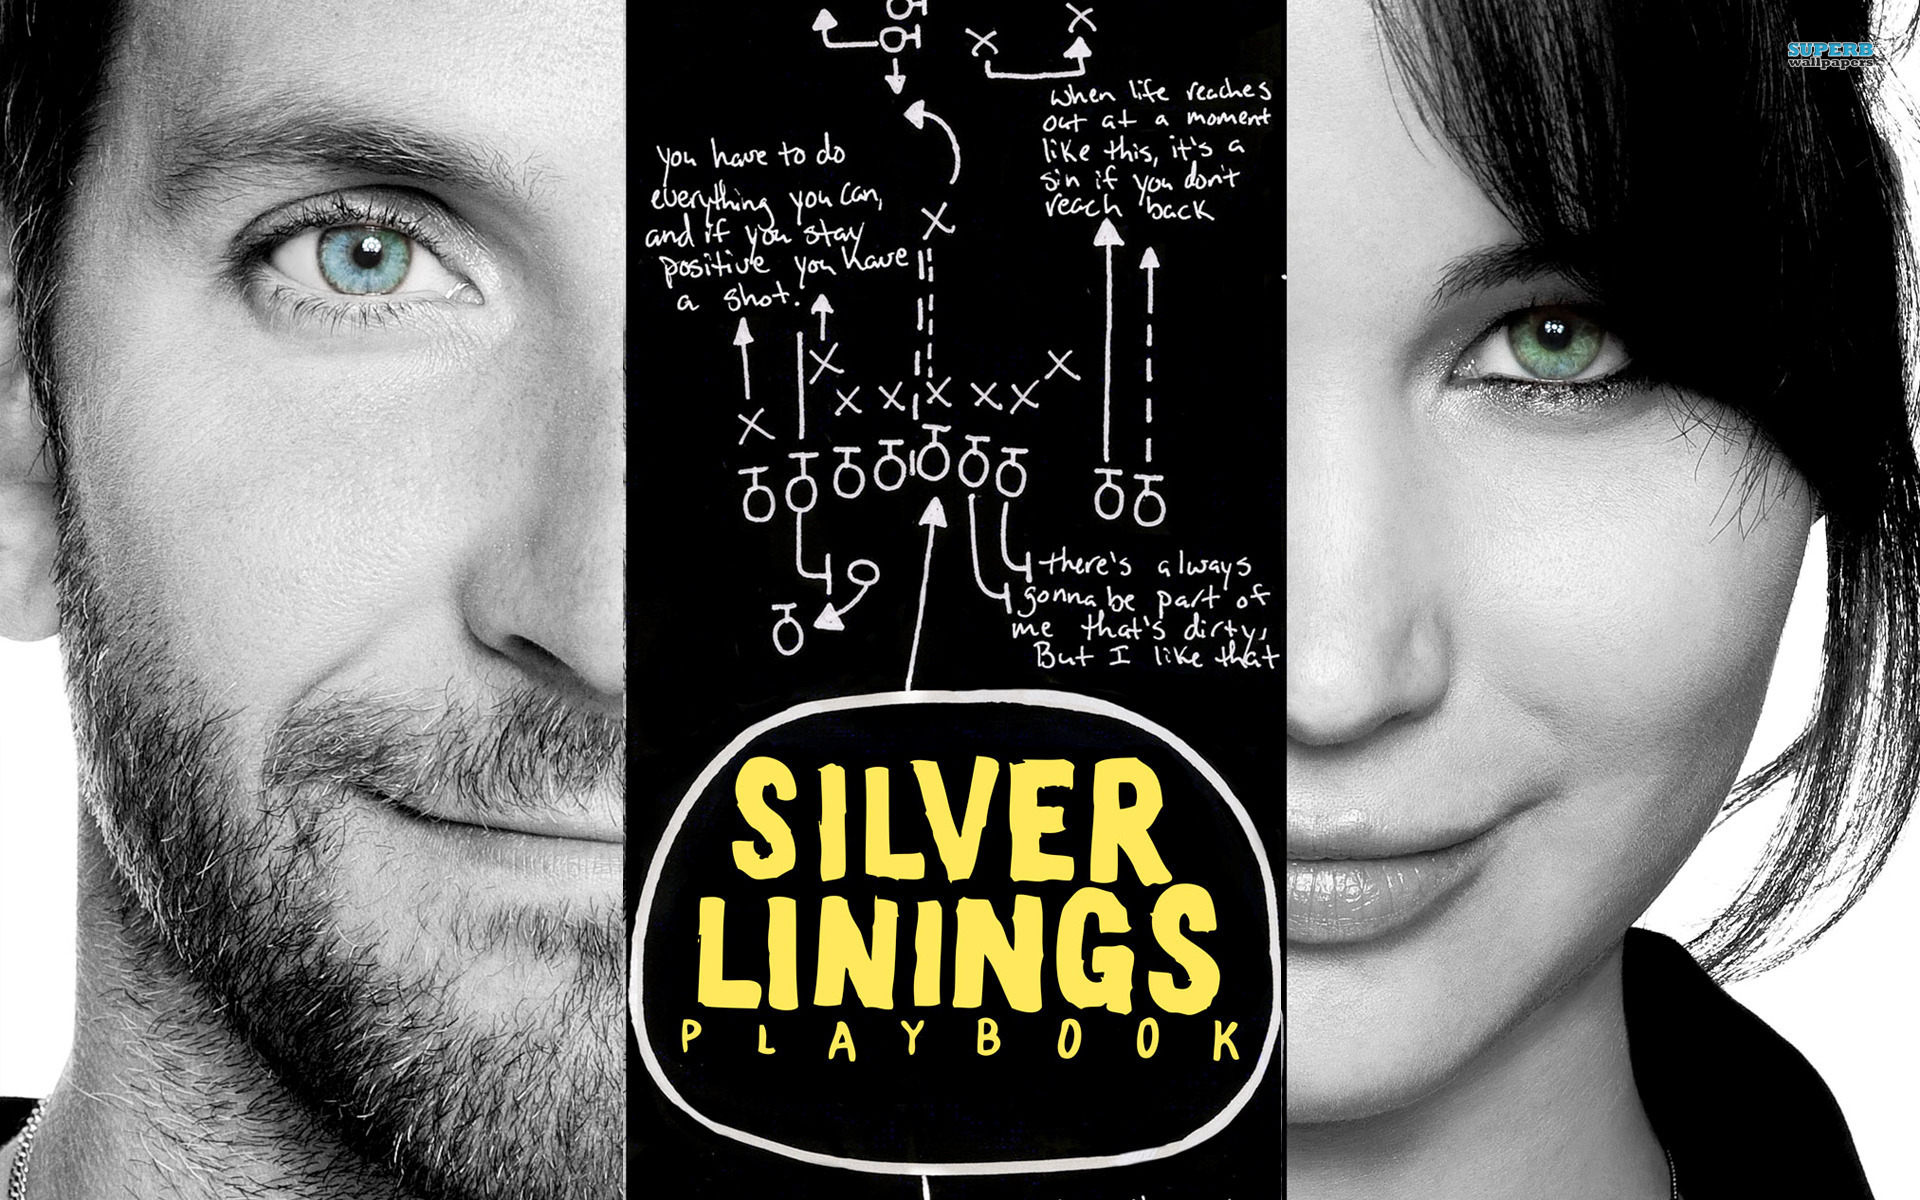 Risultati immagini per silver linings playbook